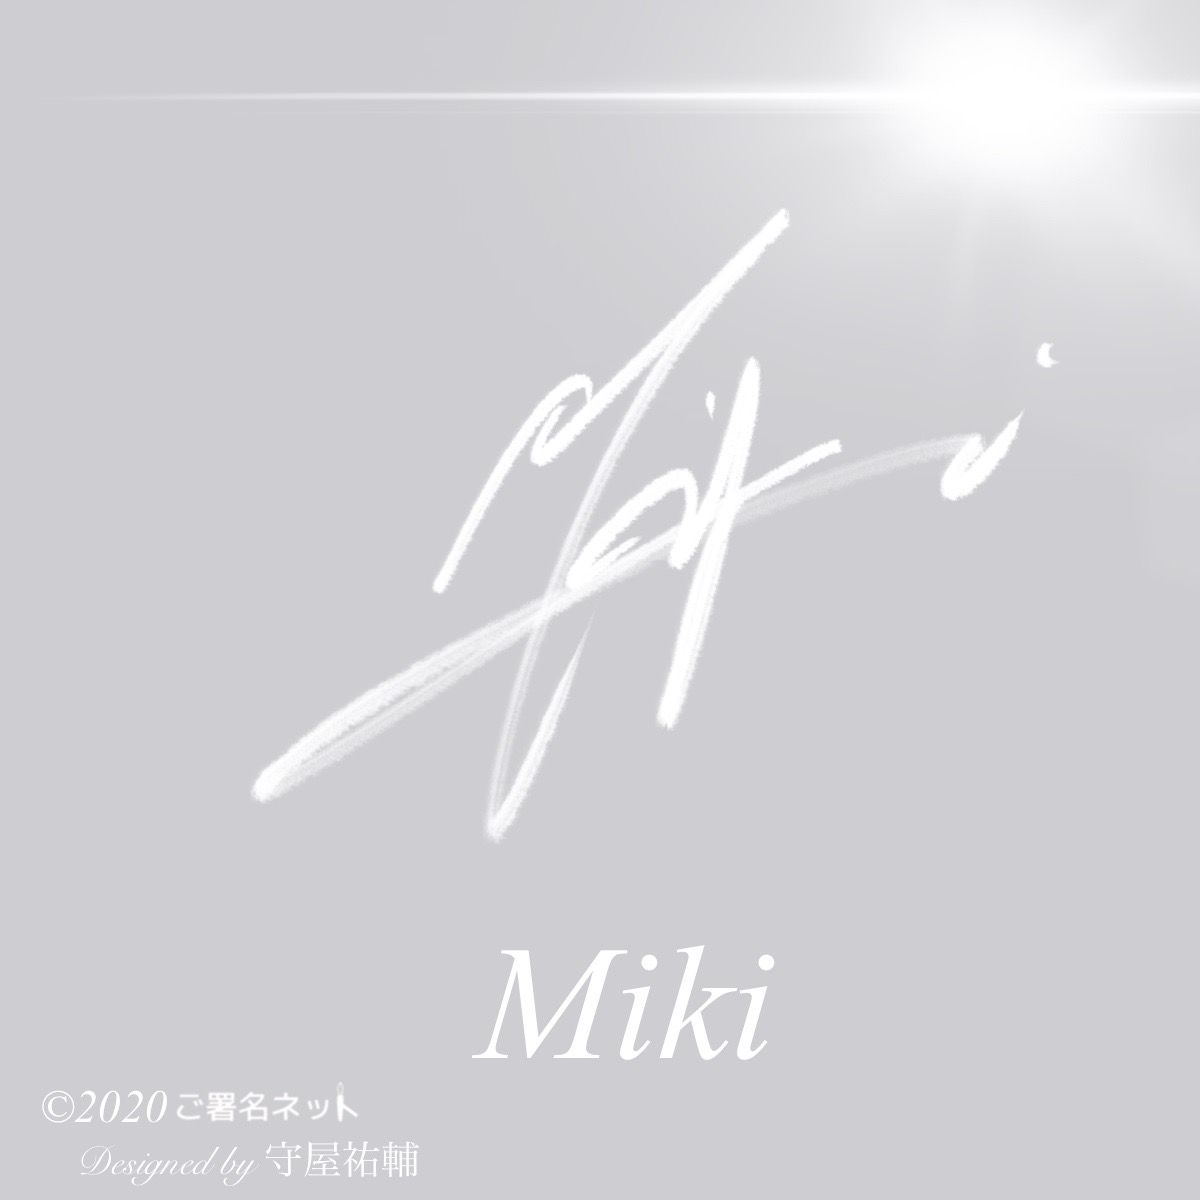 Miki の英語サイン 英語 サイン 署名 サイン